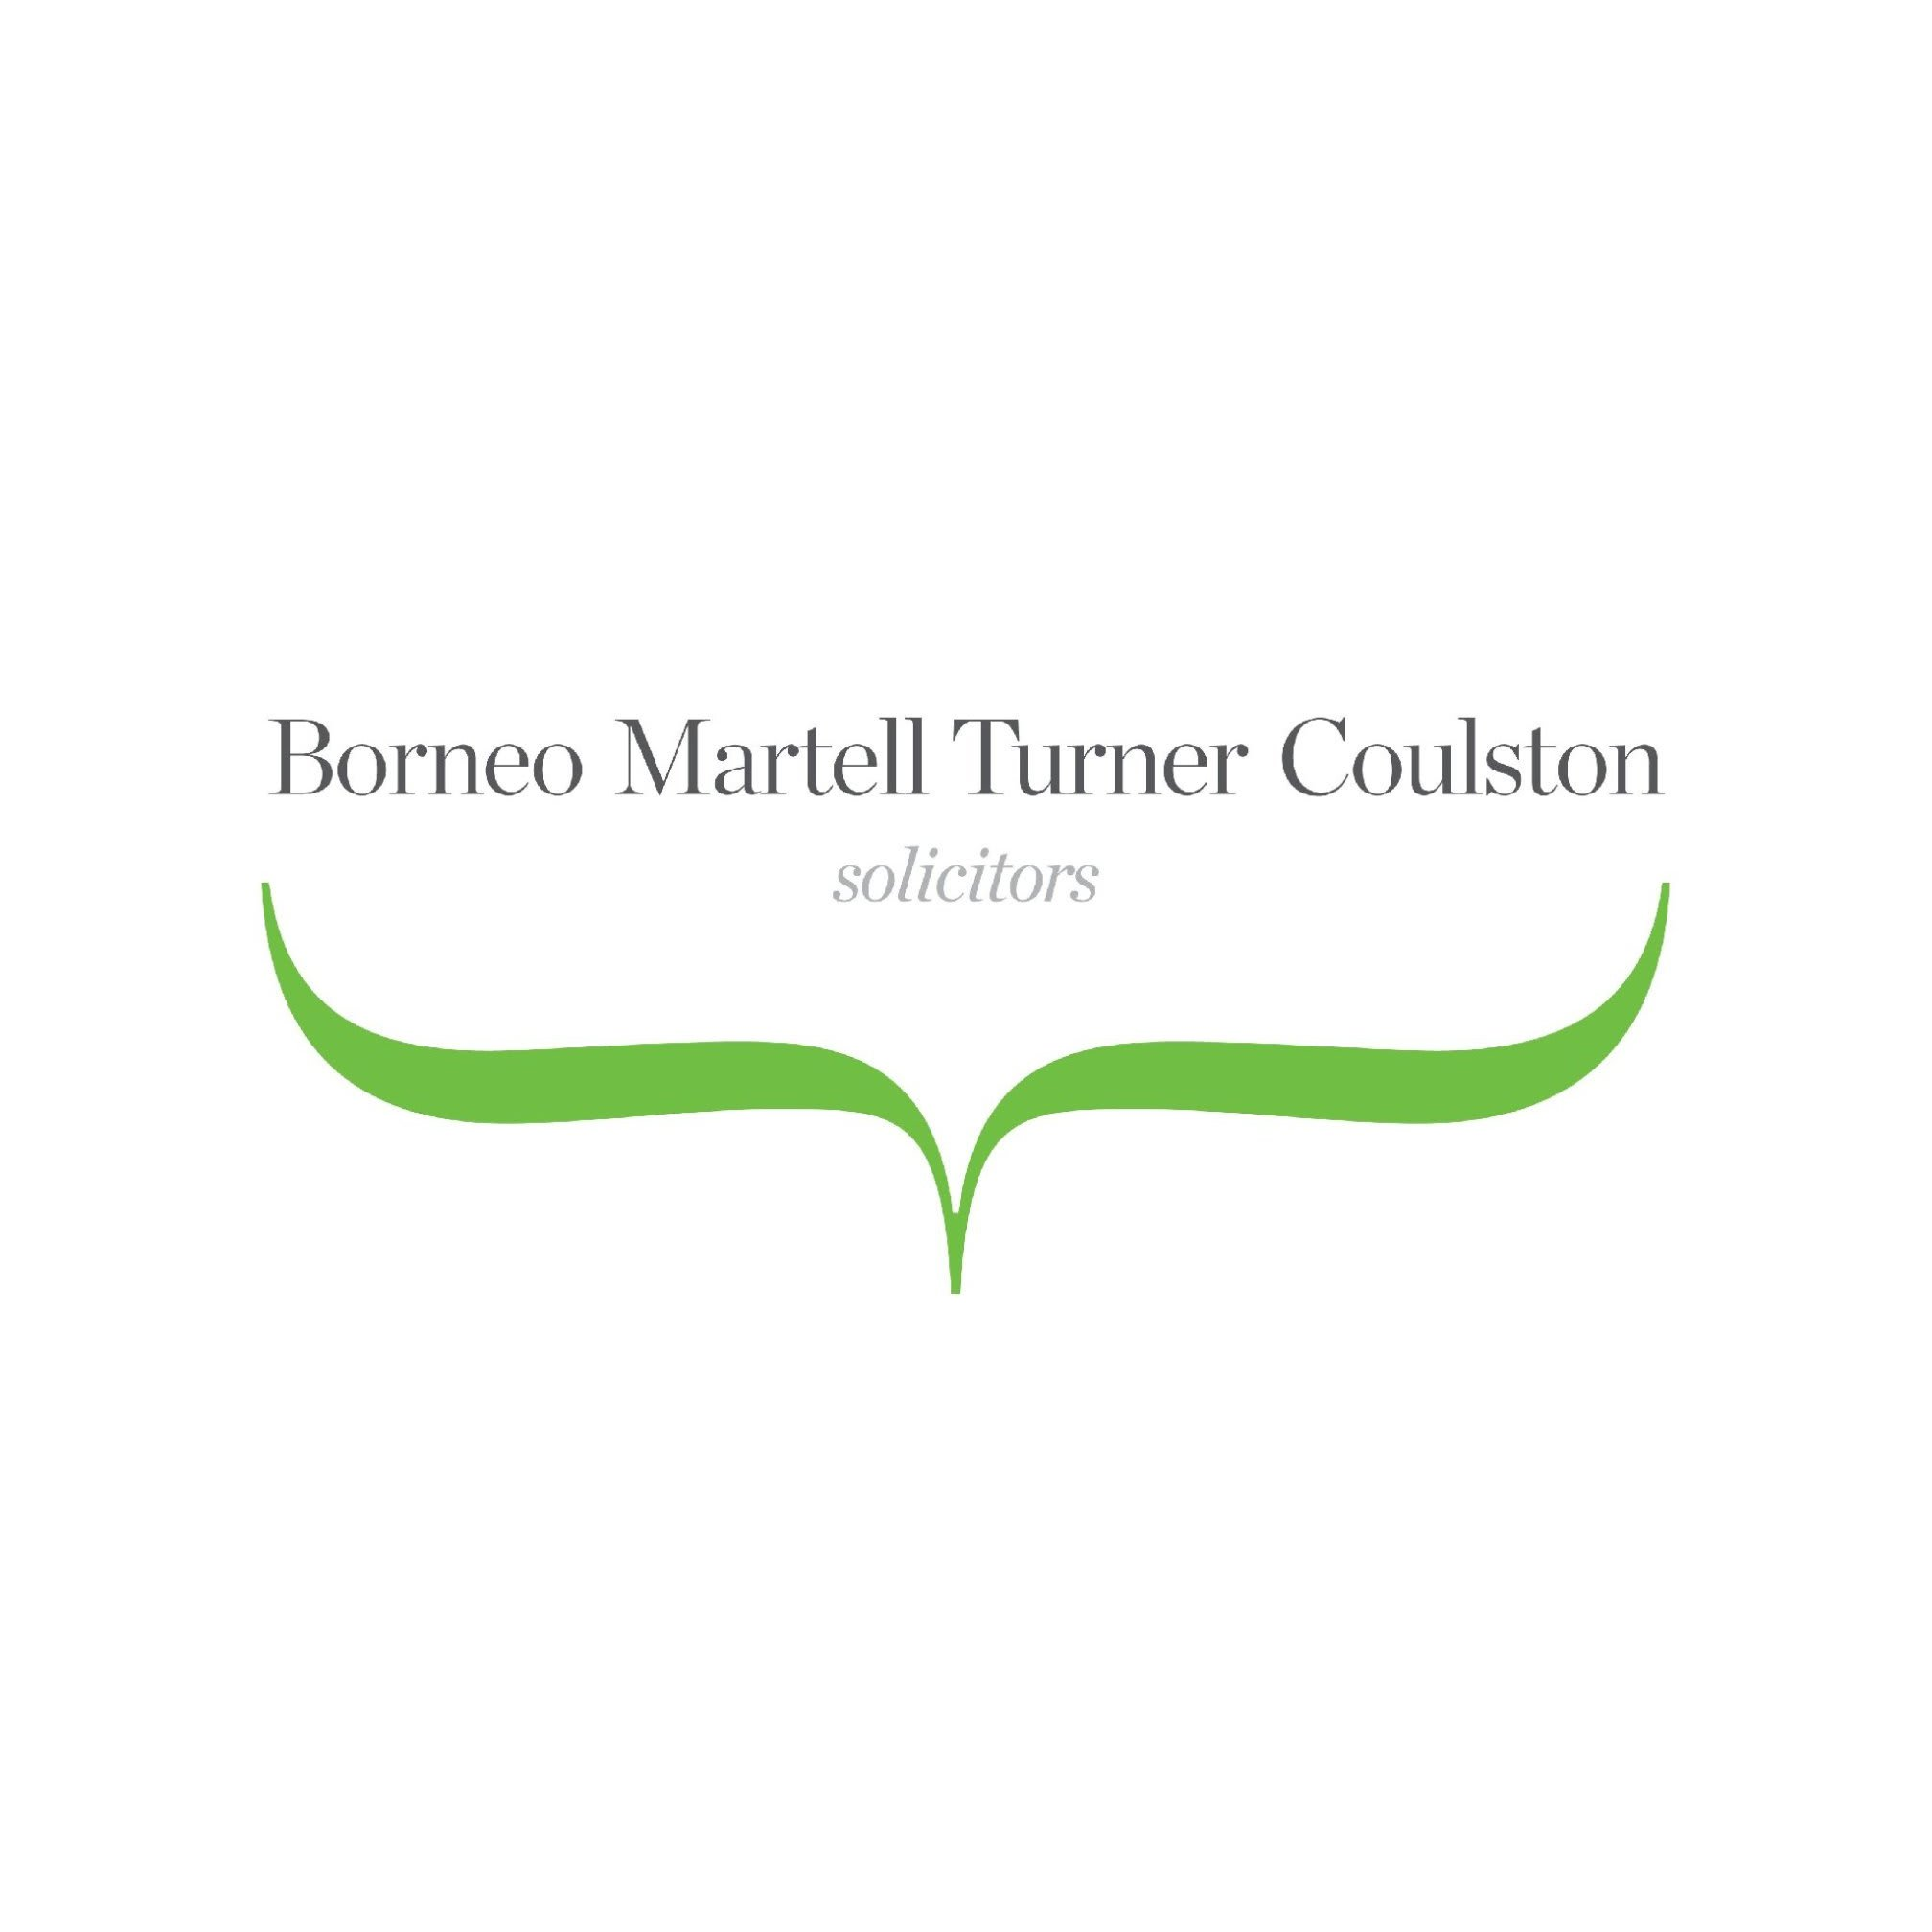 Borneo Martell Turner Coulston